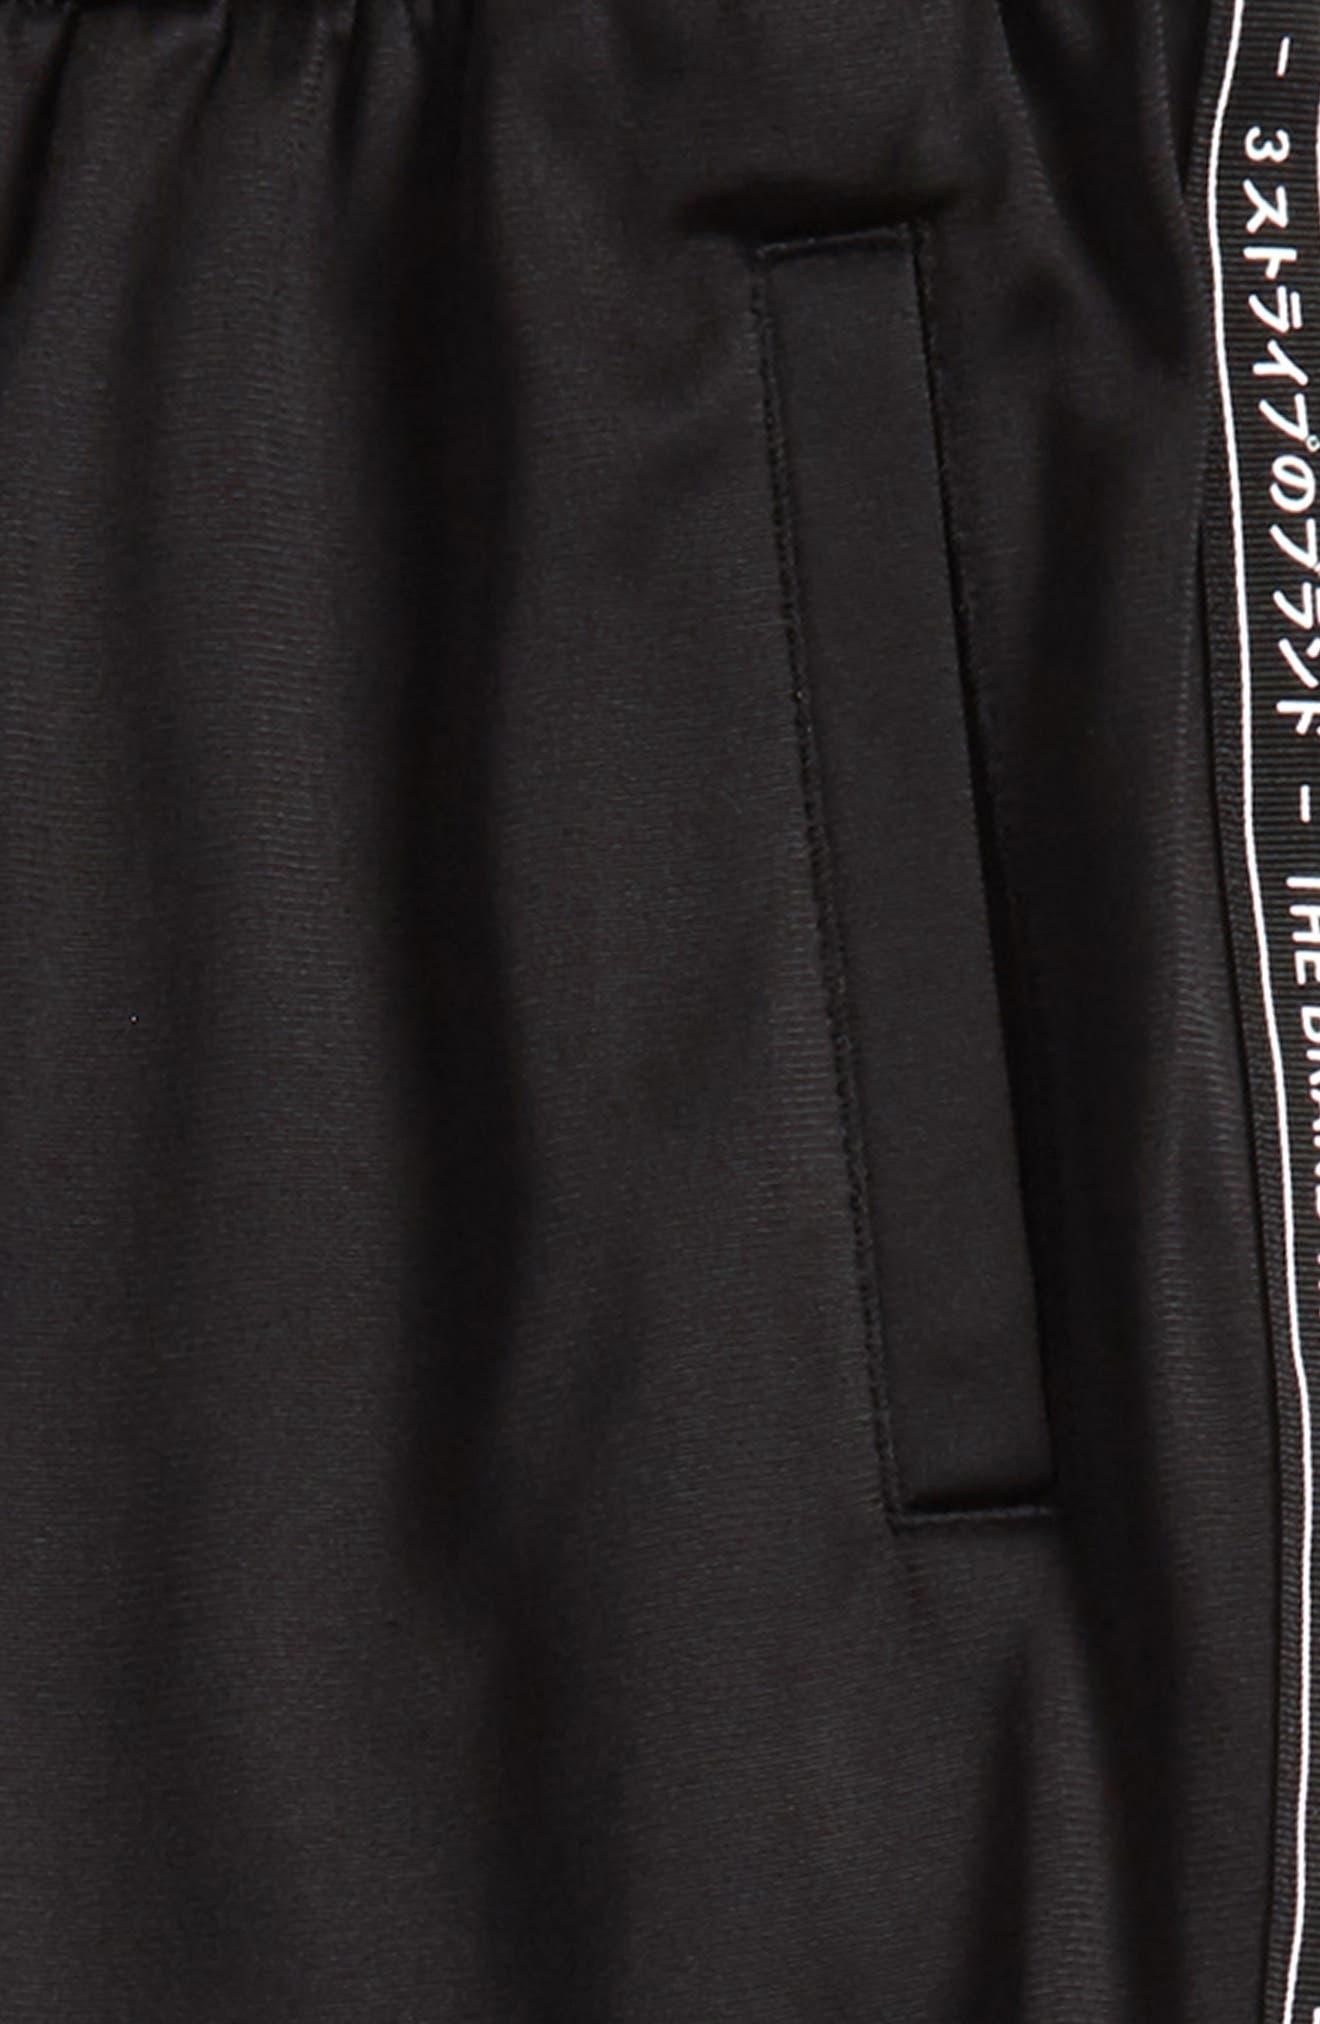 Alternate Image 2  - adidas Originals Superstar Tiro Track Pants (Little Boys & Big Boys)